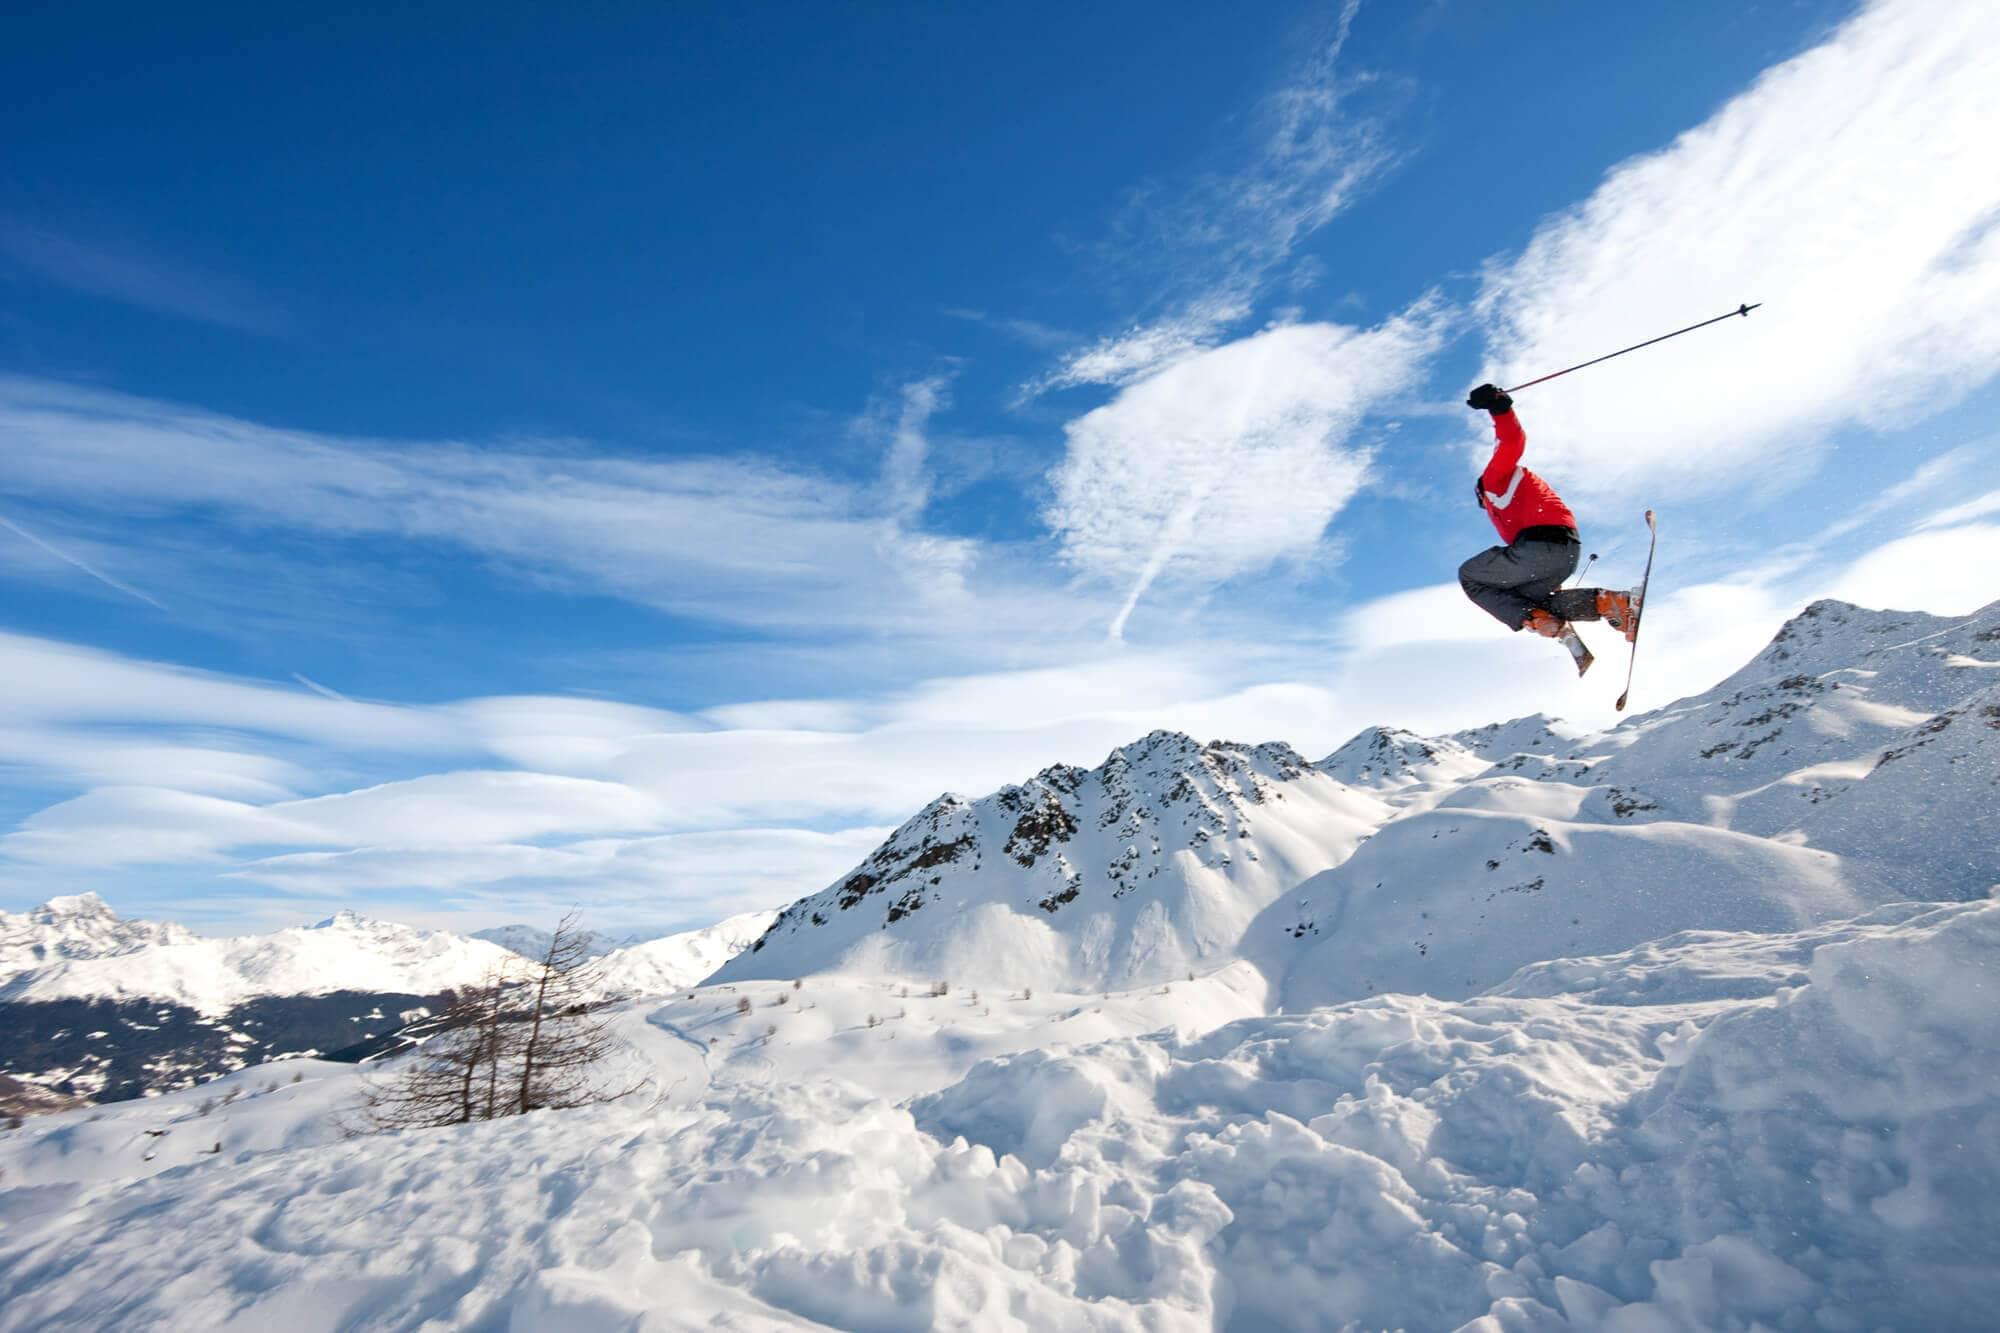 Norwegian skier jumping on snow-clad mountain #norway